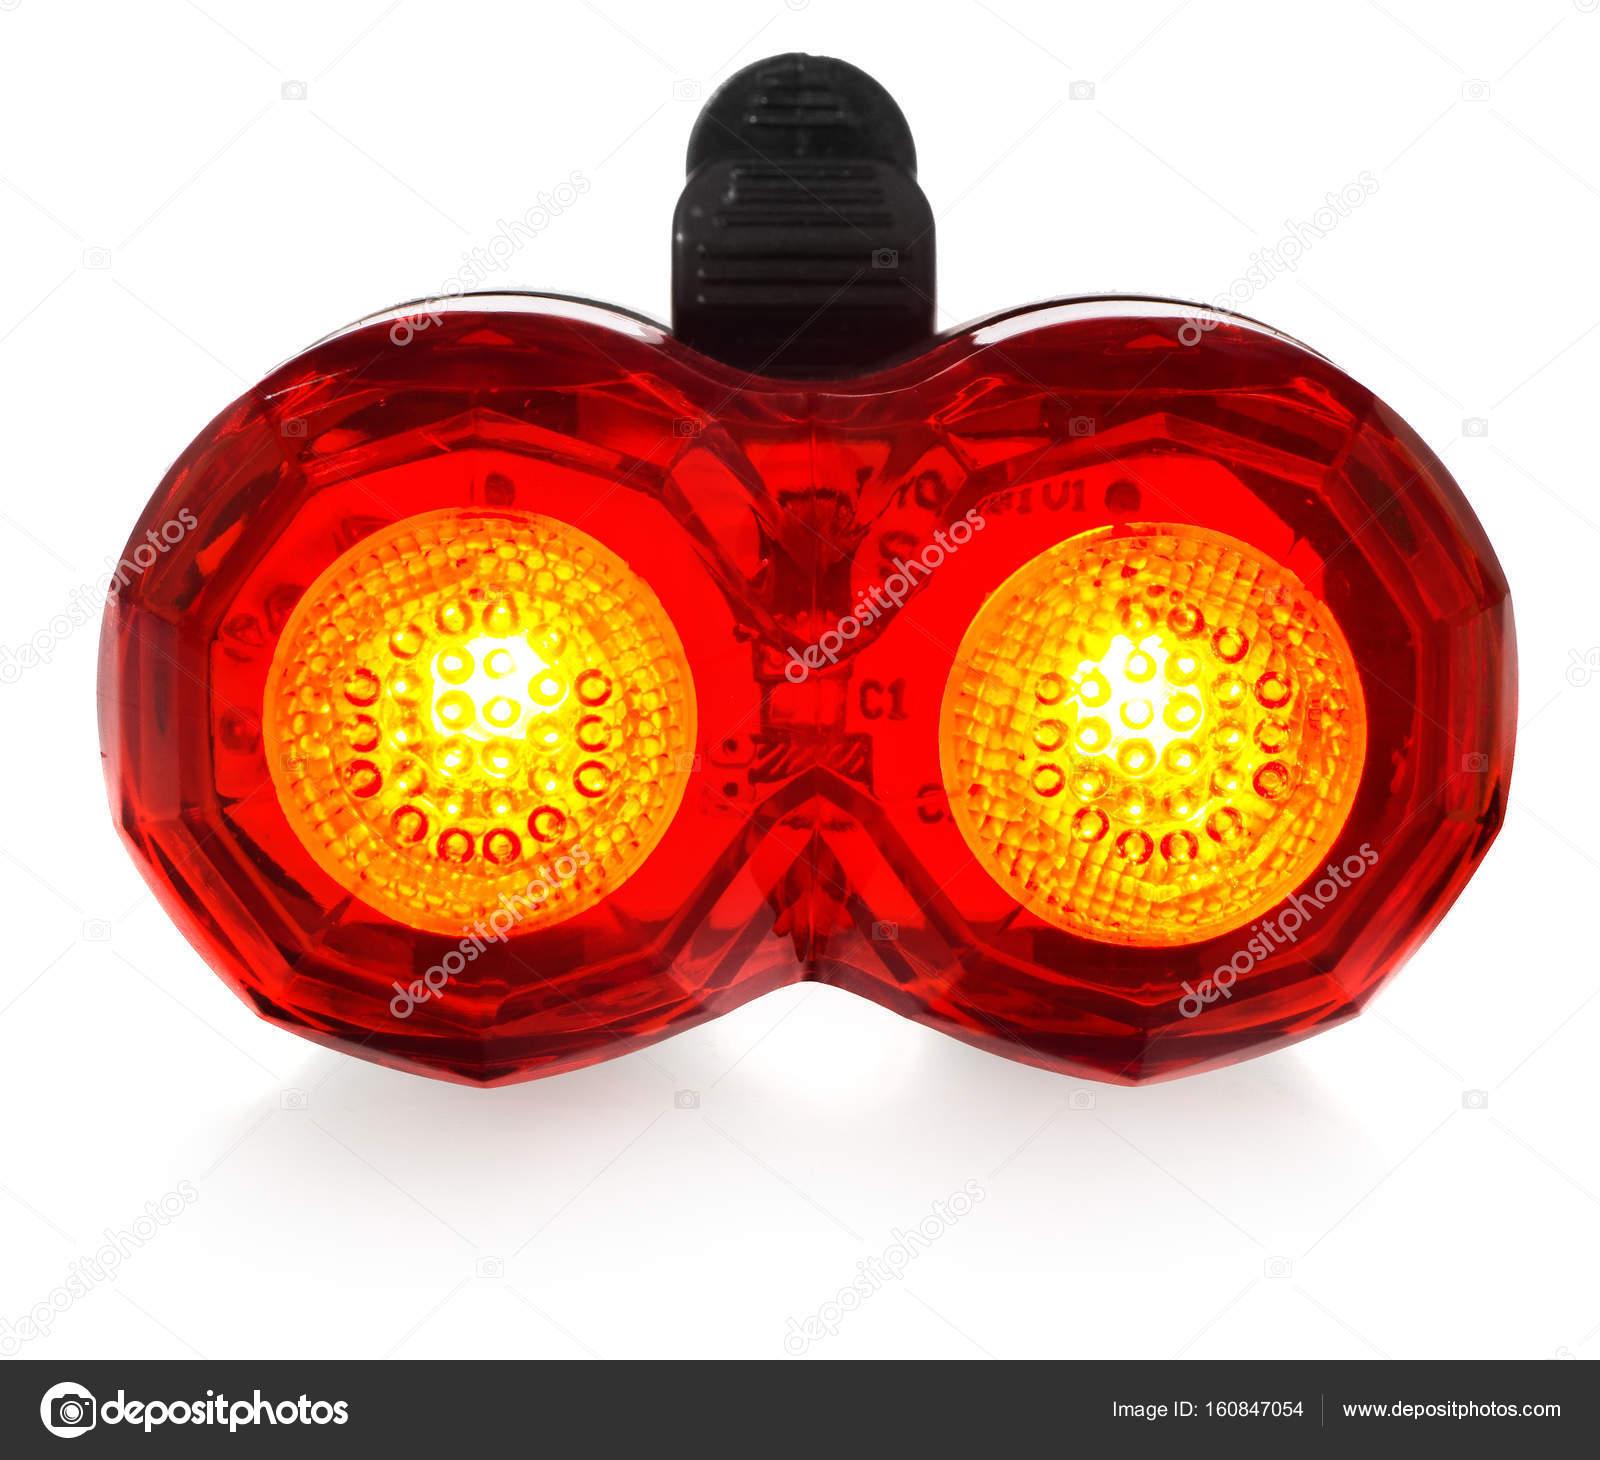 Roten Hinteren In Farbe LampeKunststoff Einer Beleuchtet Fahrrad 3q4AL5Rj